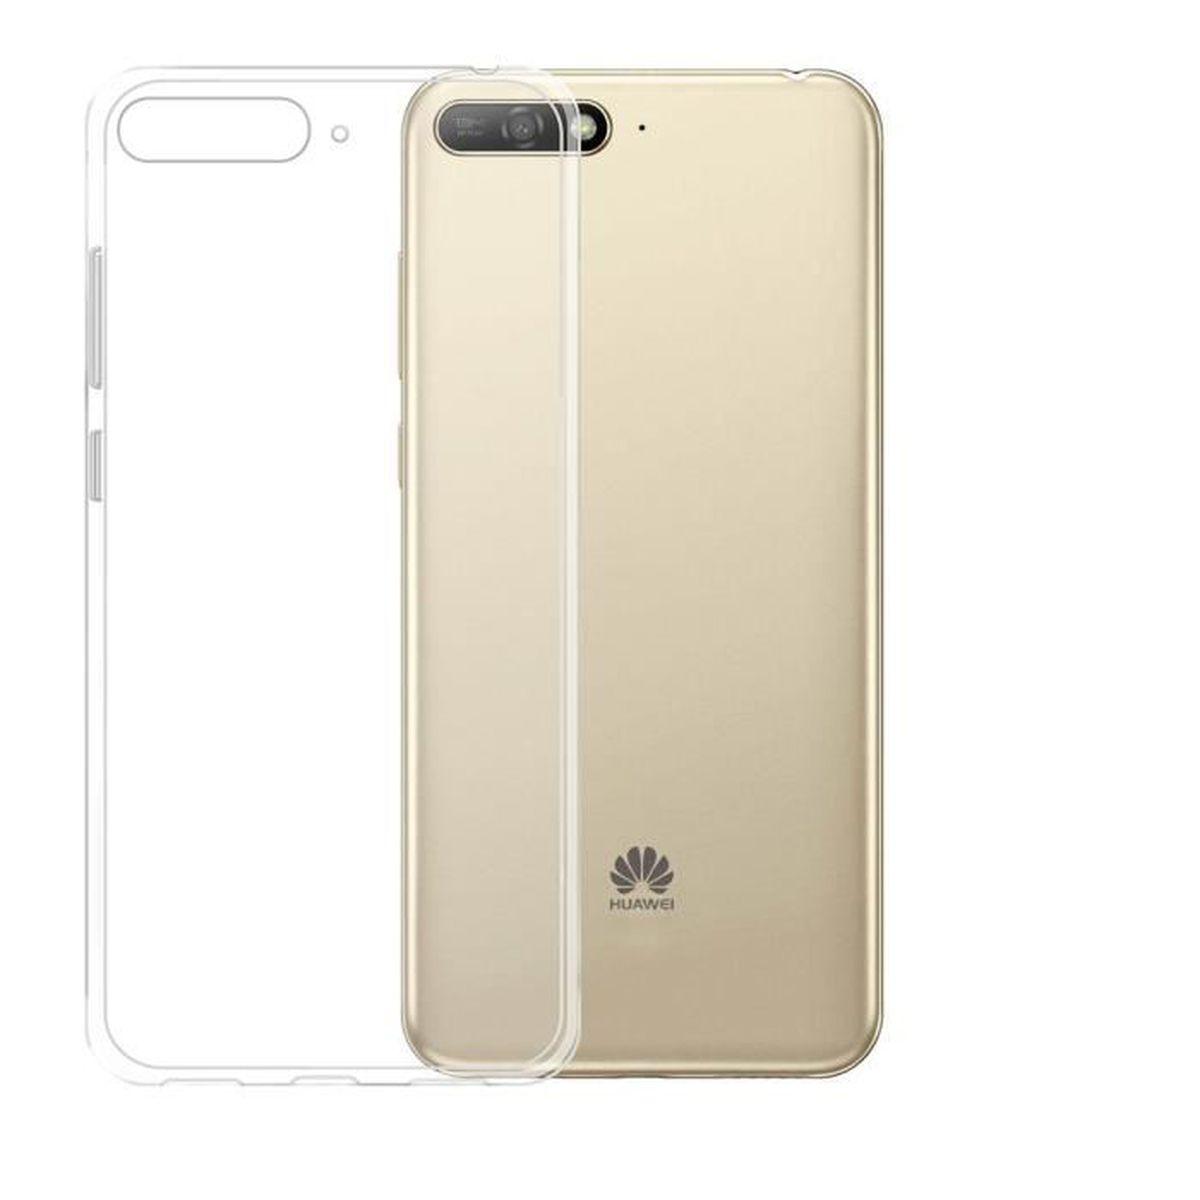 Coque pour Huawei Y6 2018 Transparente Etui TPU conception Housse Souple Silicone Protection Case Cover